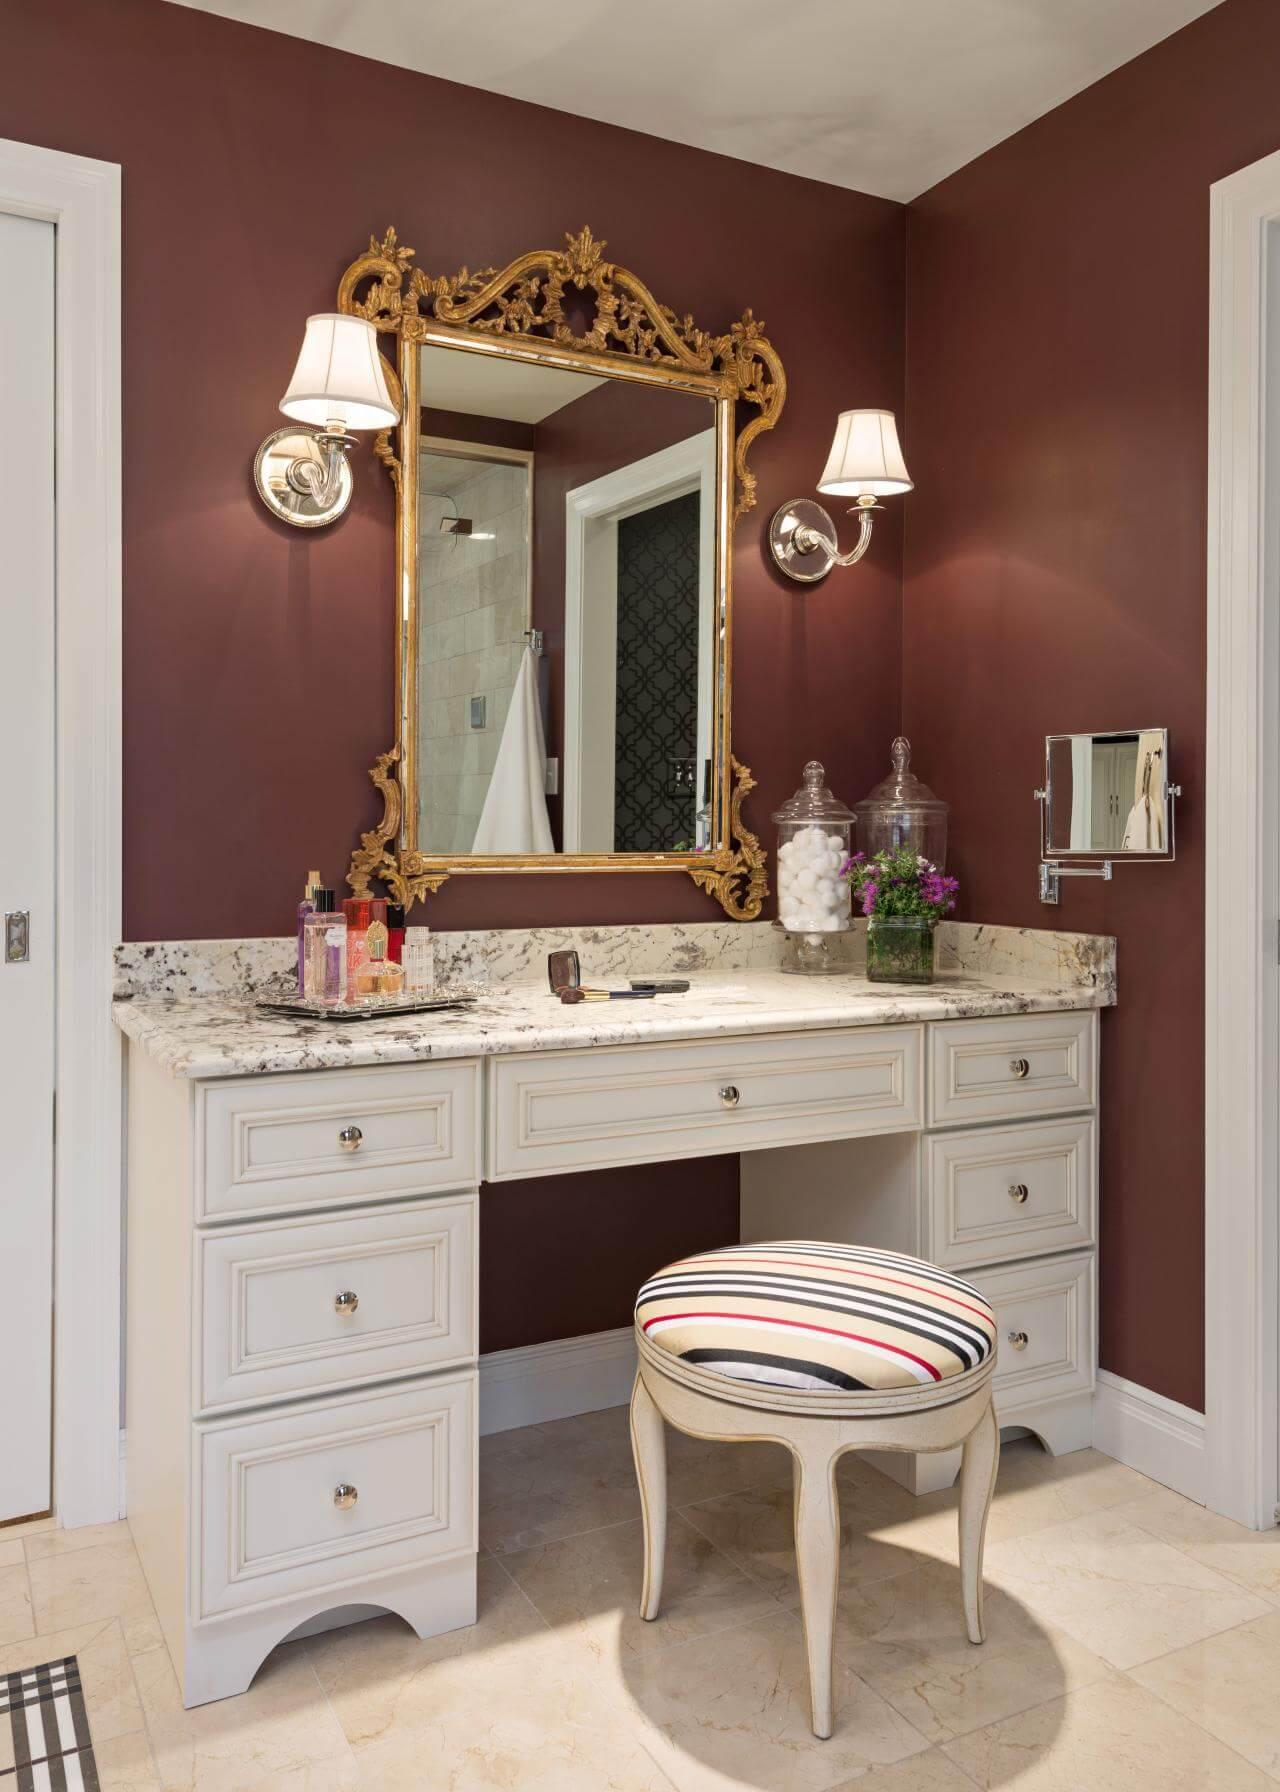 Meuble-lavabo en marbre avec miroir de style baroque